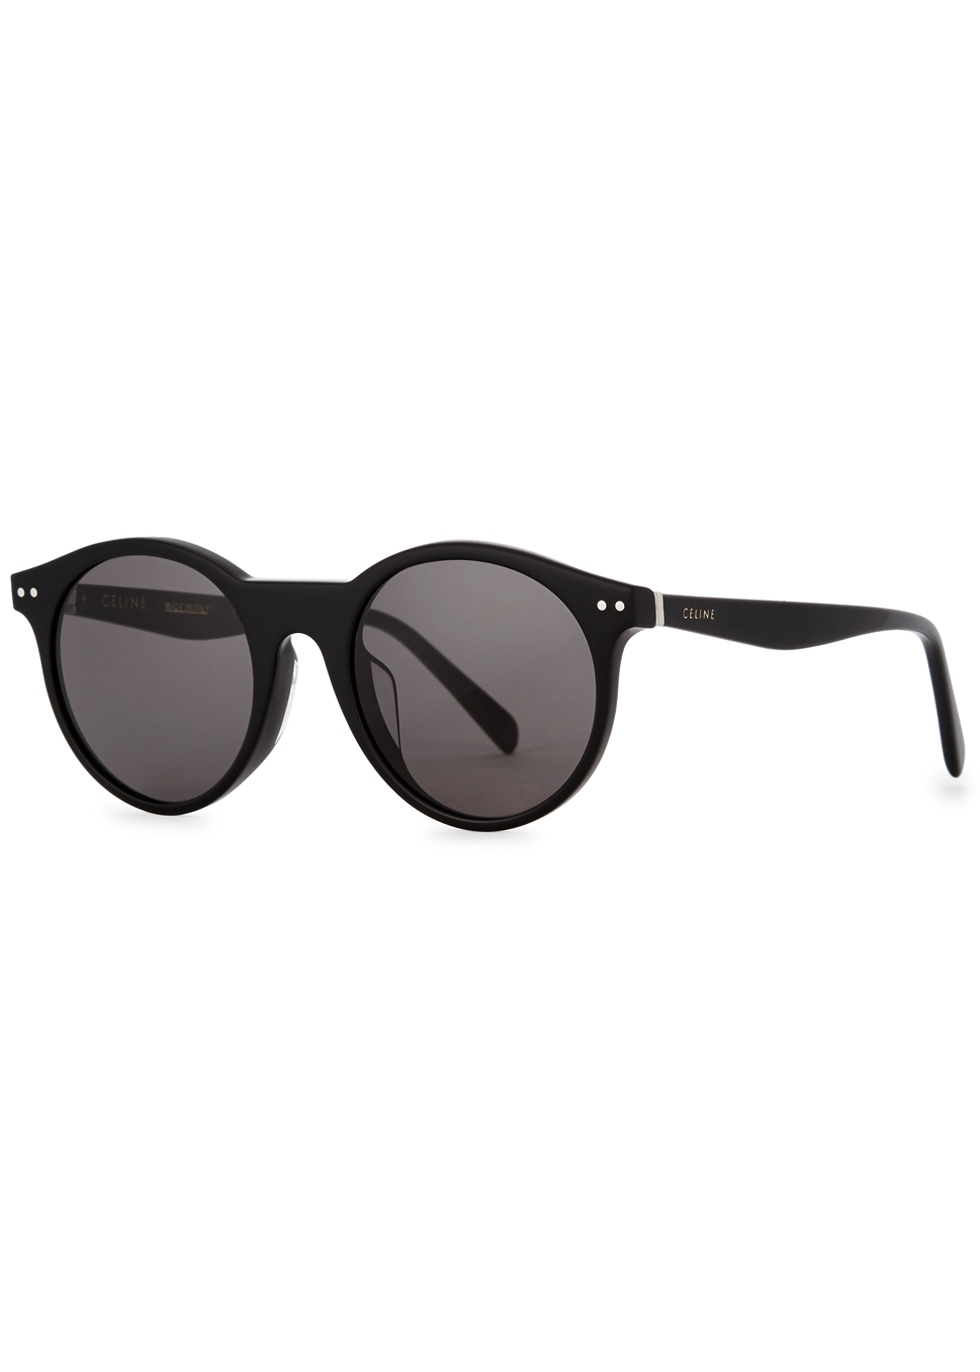 57fdf3633041 Celine Sunglasses